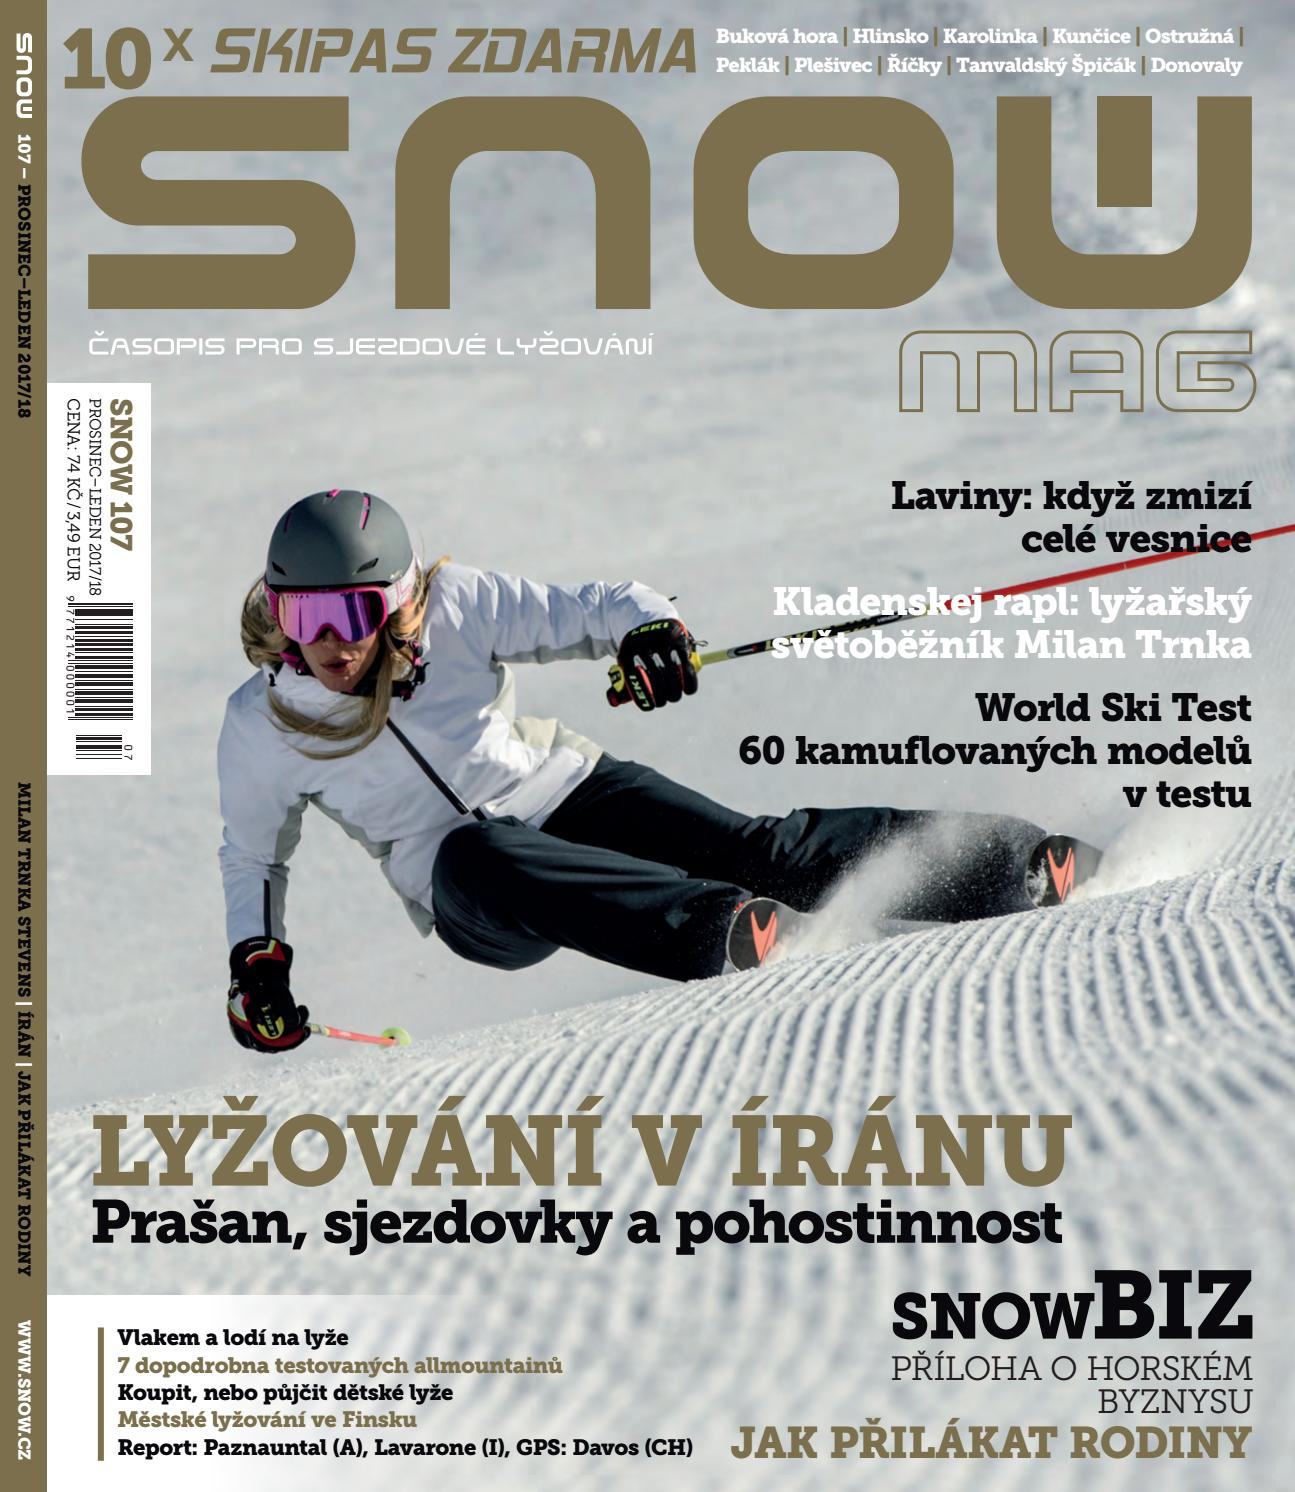 SNOW 107 - prosinec leden 2017 18 by SNOW CZ s.r.o. - issuu a4327f8381